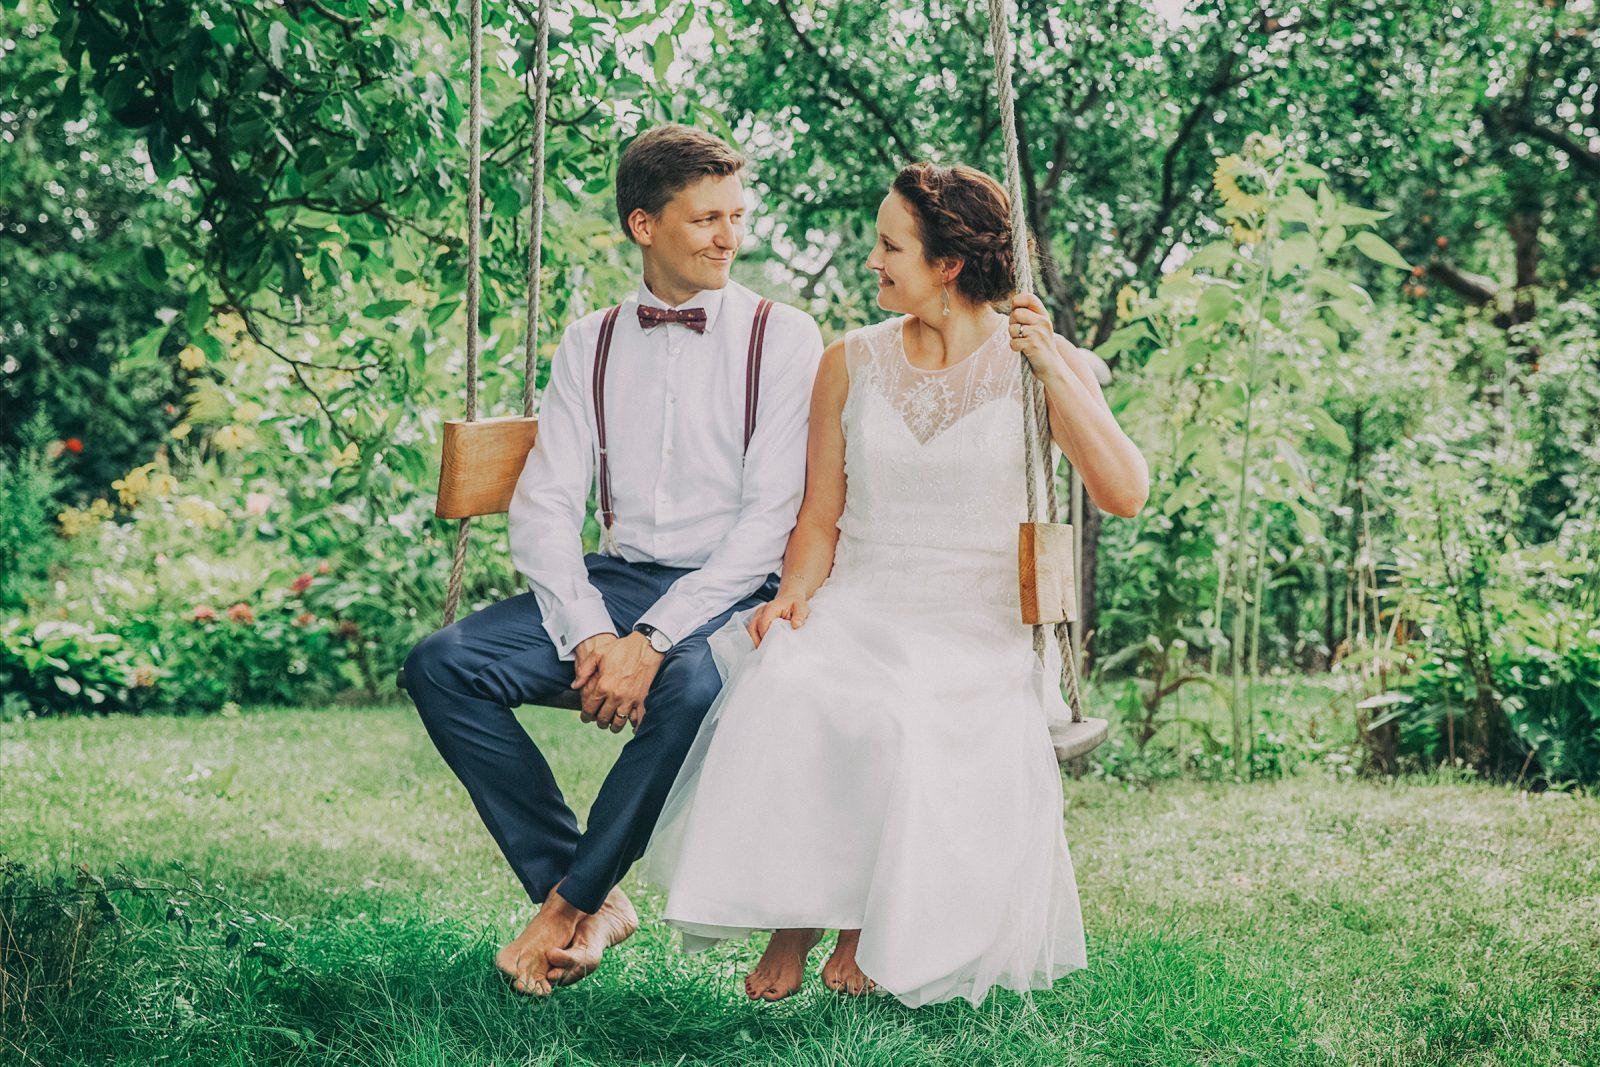 Hochzeit_Potsdam_fotograf_G24